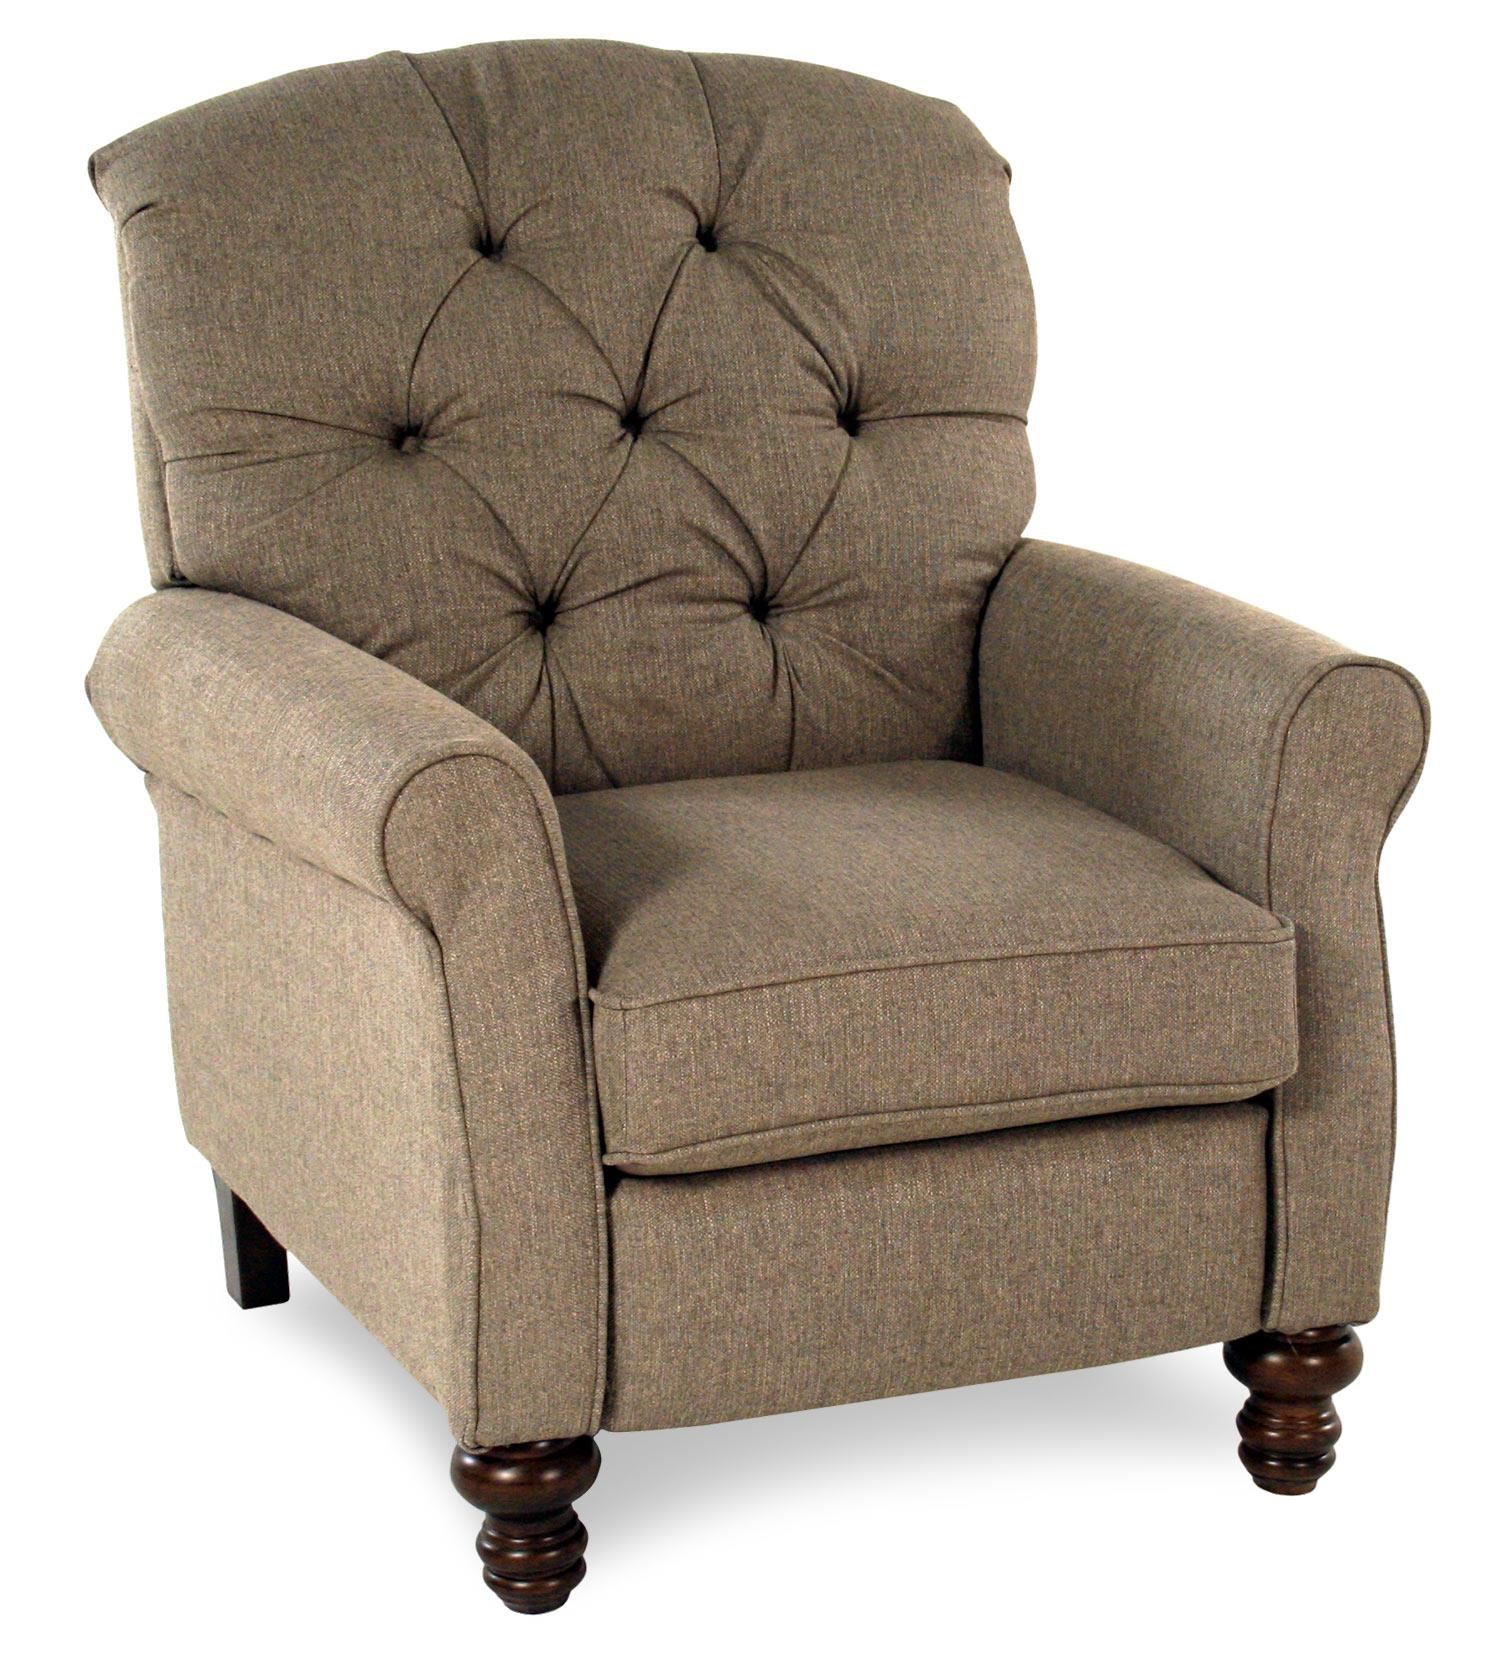 Serta Upholstery Pemberly Traditional High Leg Recliner